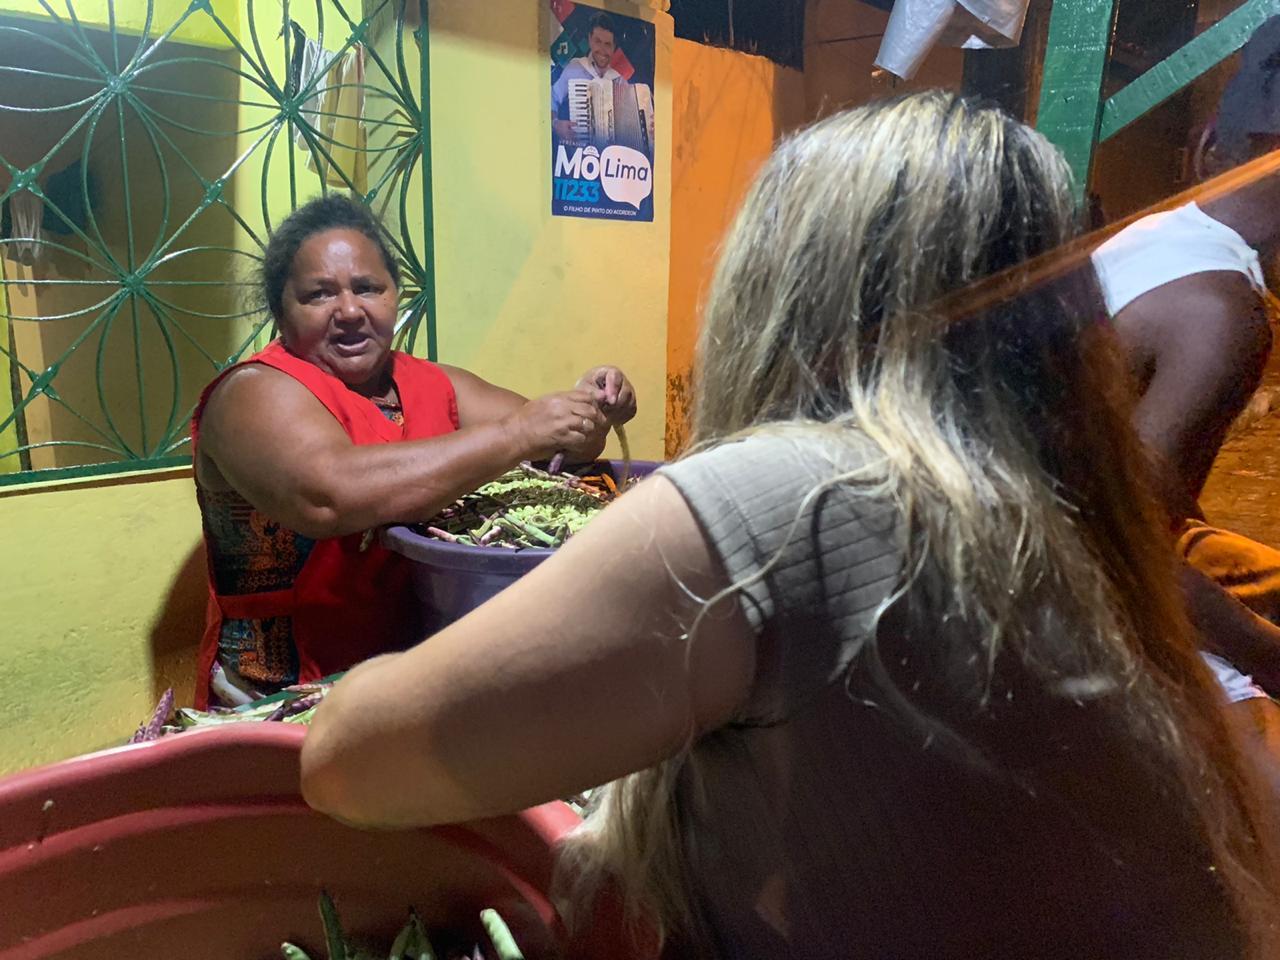 WhatsApp Image 2020 11 05 at 21.43.01 - Se recuperando de uma crise de cálculo renal, Nilvan Ferreira envia esposa para cumprir sua agenda de campanha